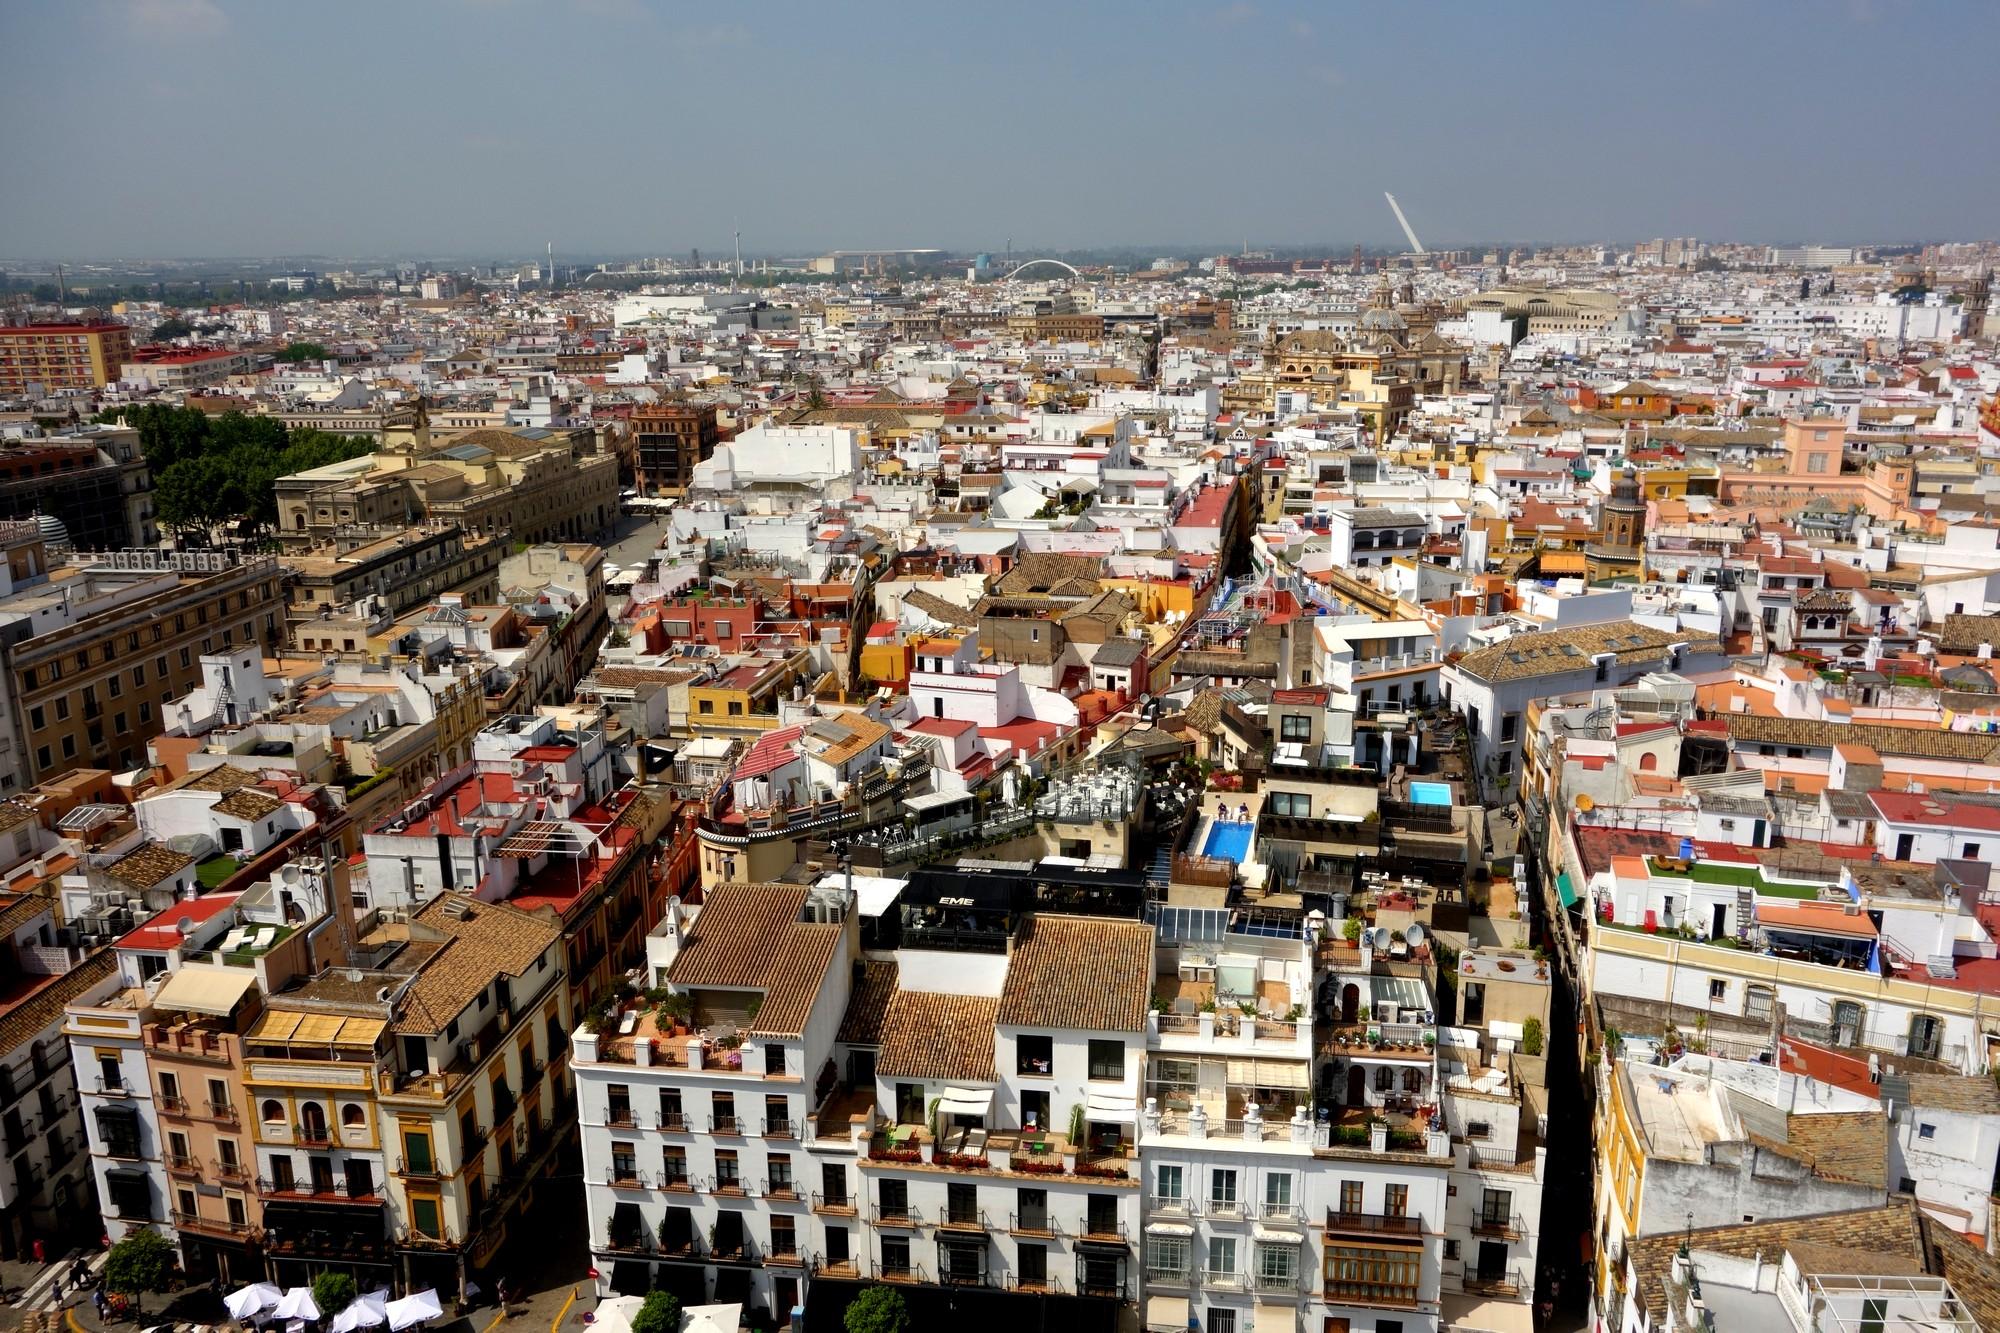 Севилья - вид с башни (Испания)